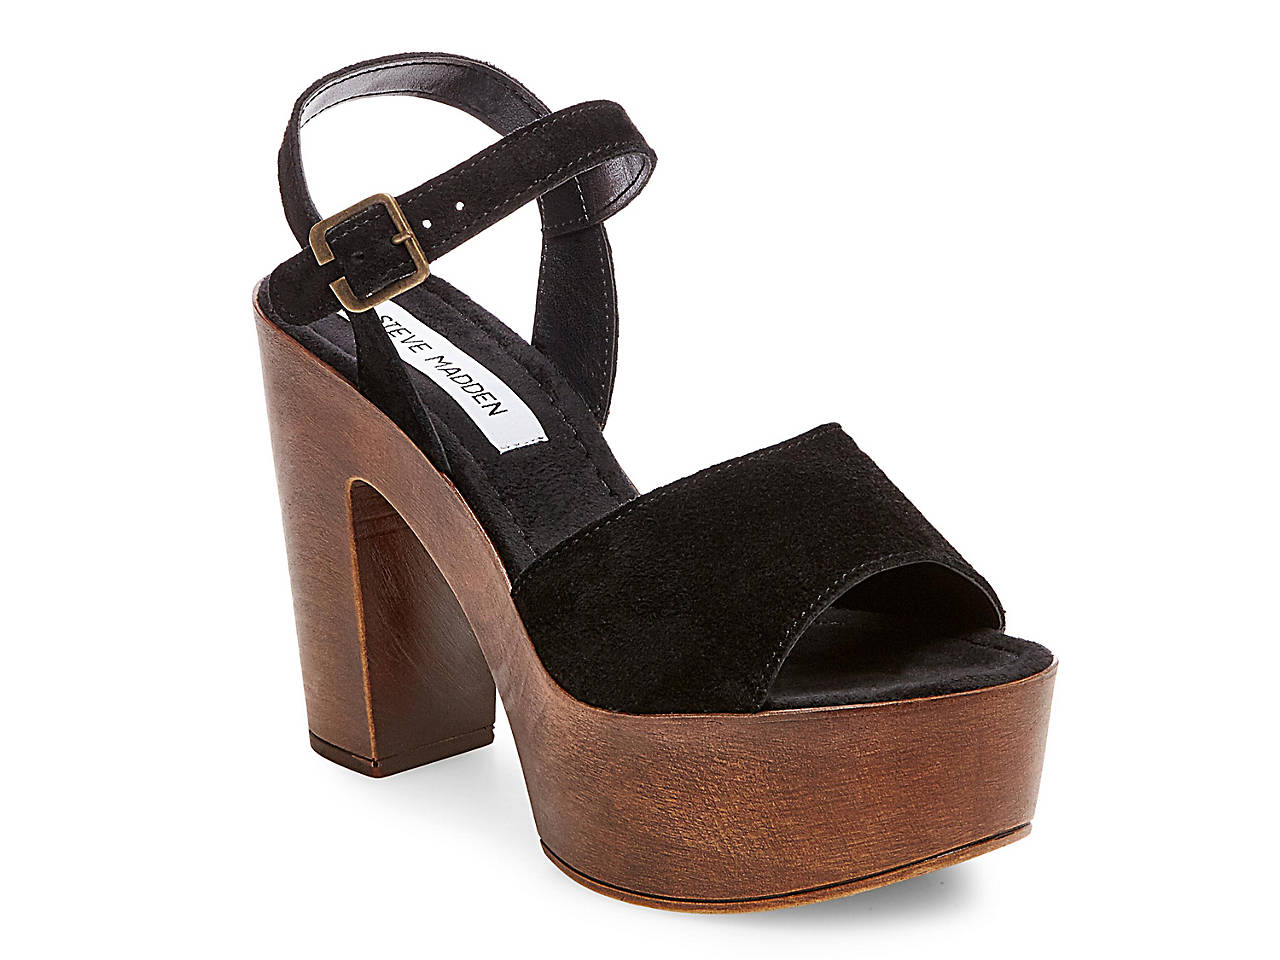 453218b8dd4d Steve Madden Lulla Platform Sandal Women s Shoes